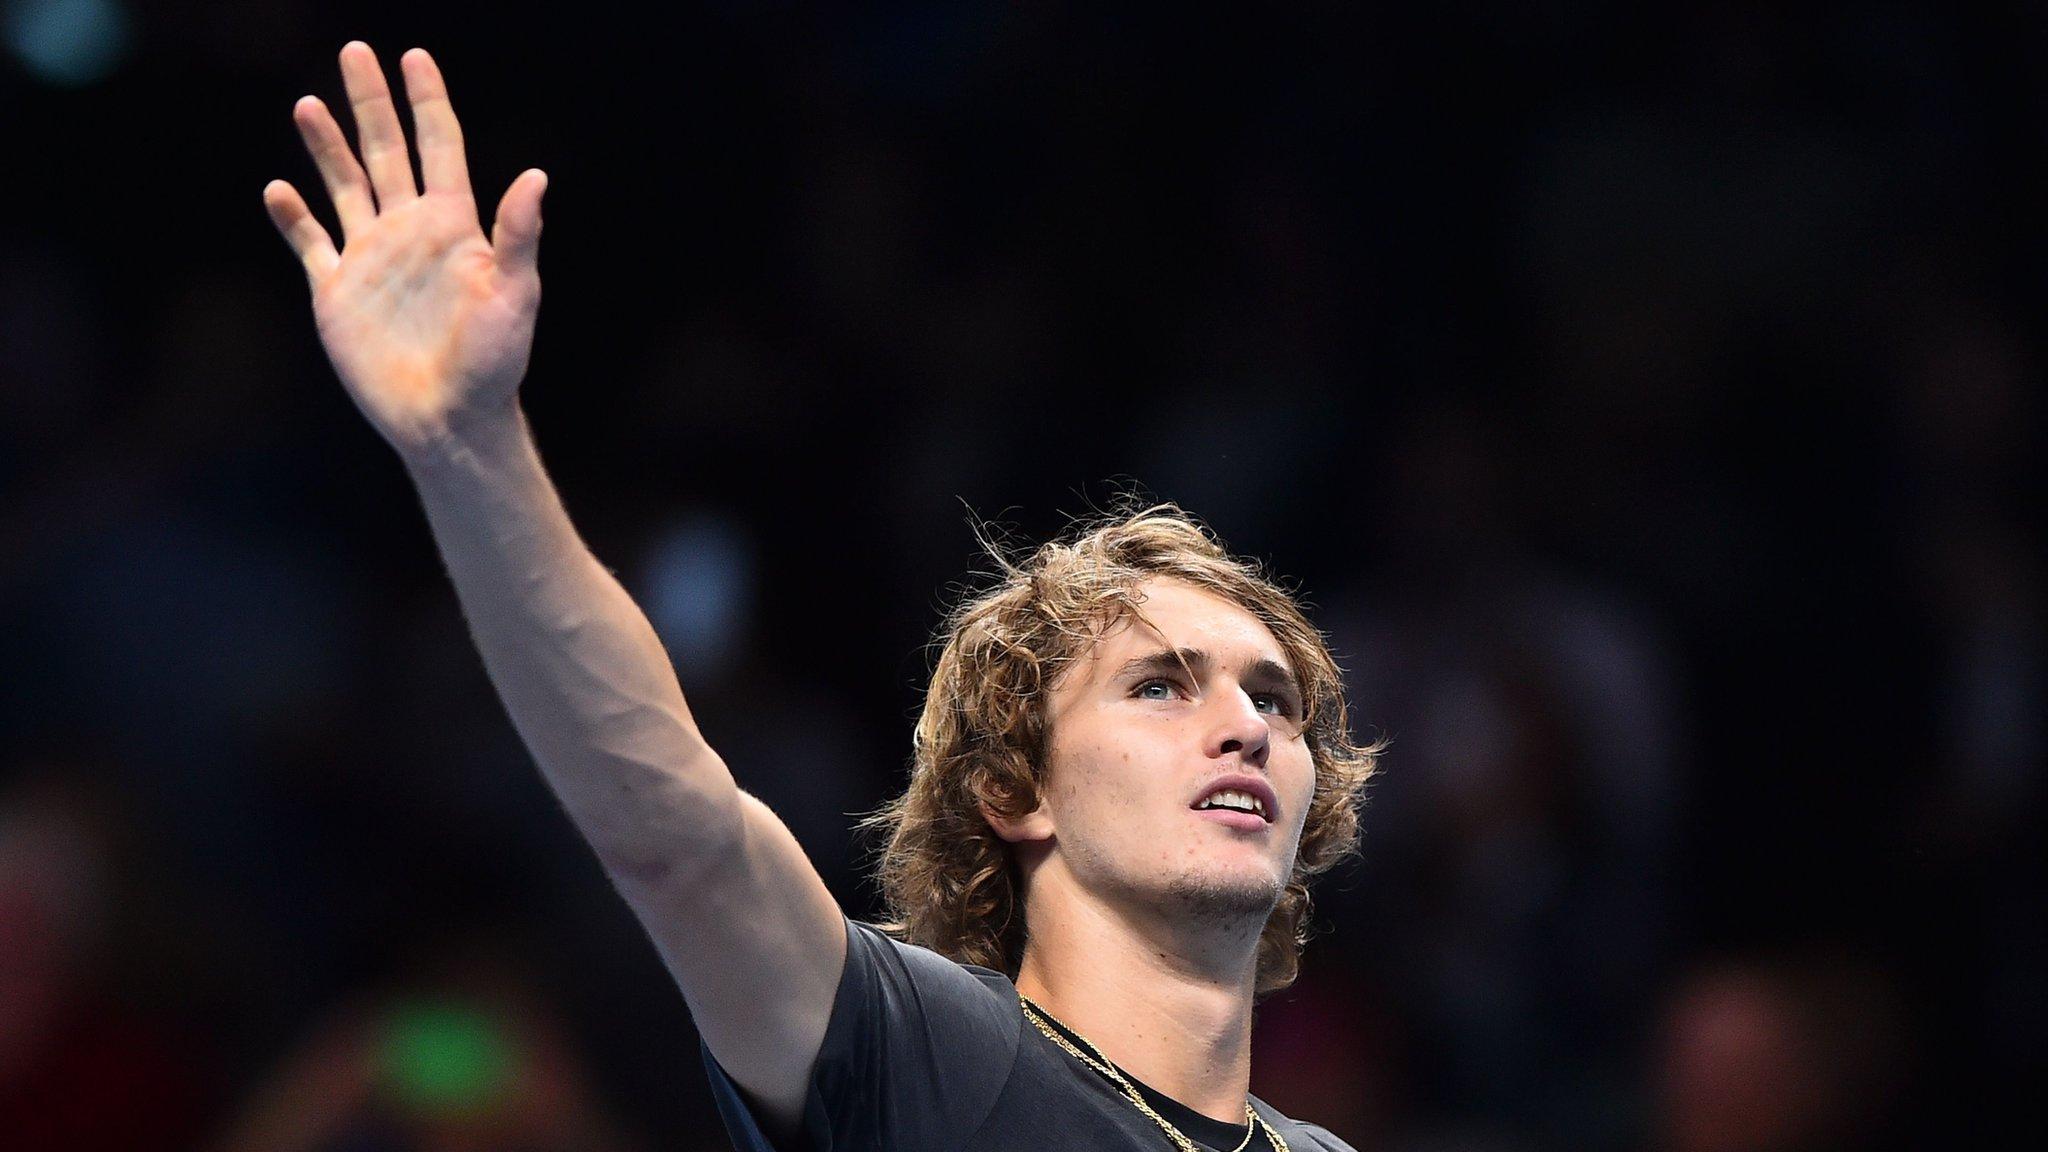 ATP Finals: Alexander Zverev beats John Isner to set up Roger Federer semi-final